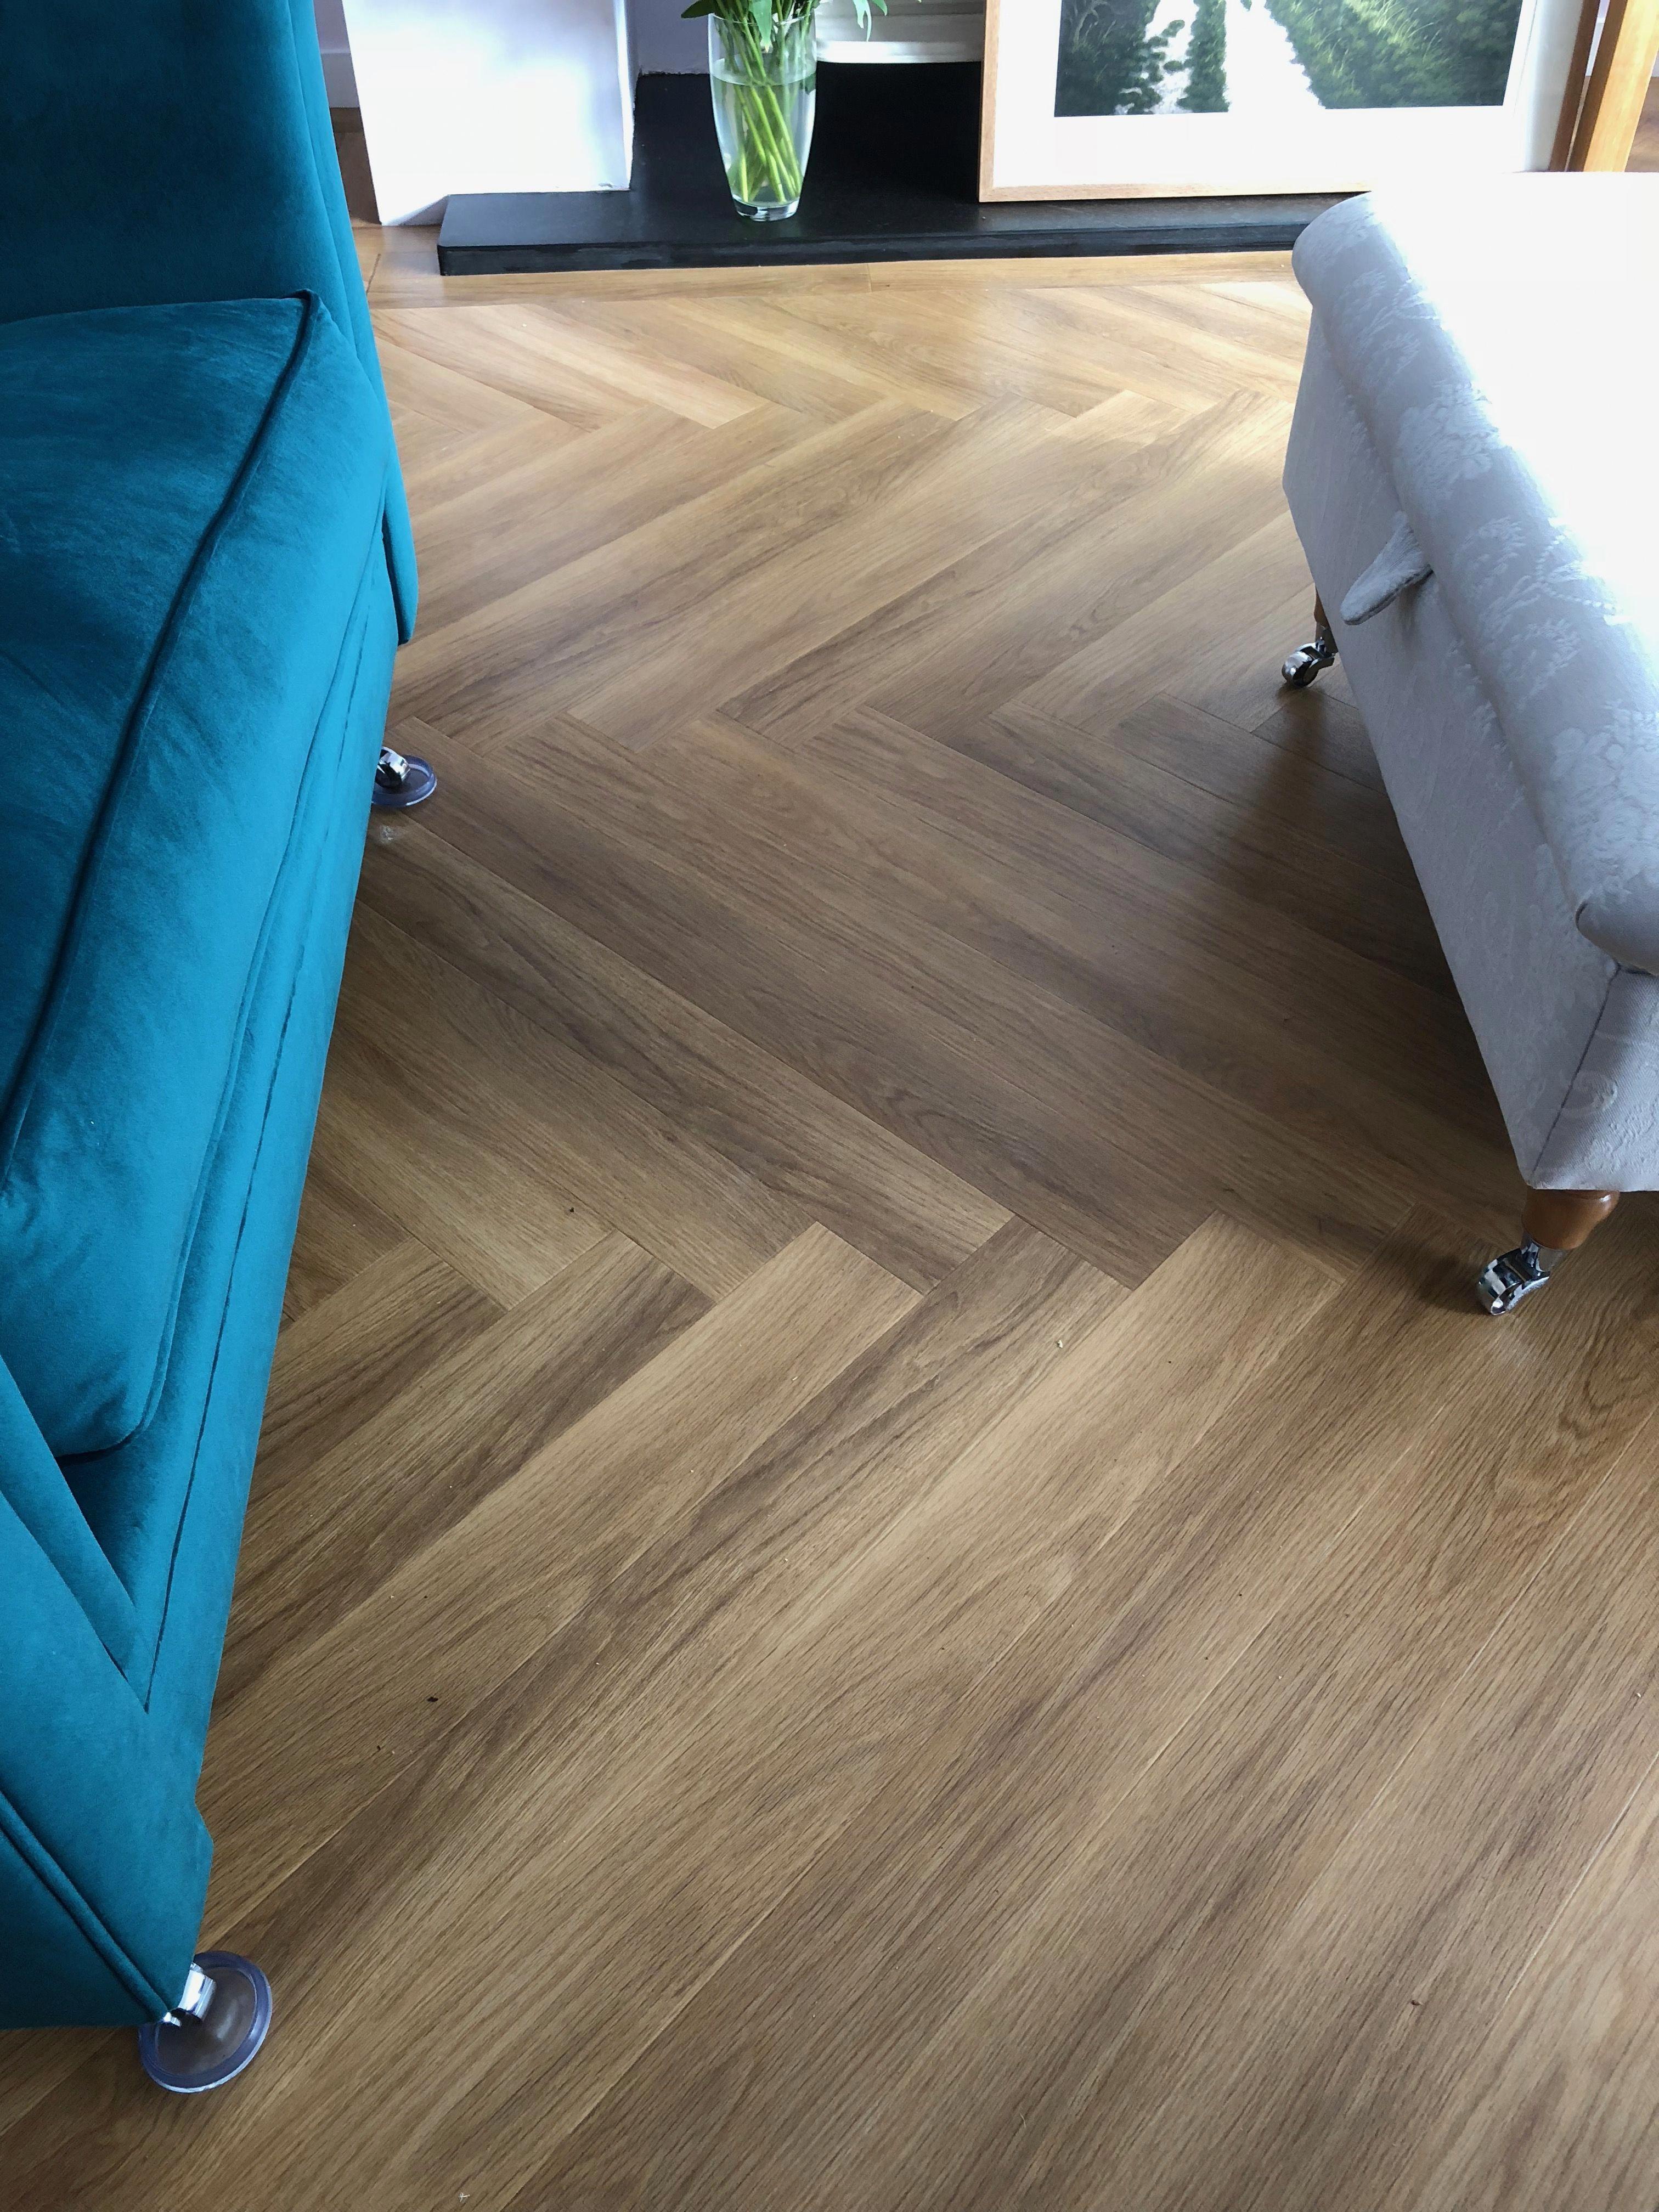 Amtico Spacia Honey Oak Herringbone Plank Hardwoodflooringbest Hardwood Floors Flooring Amtico Flooring